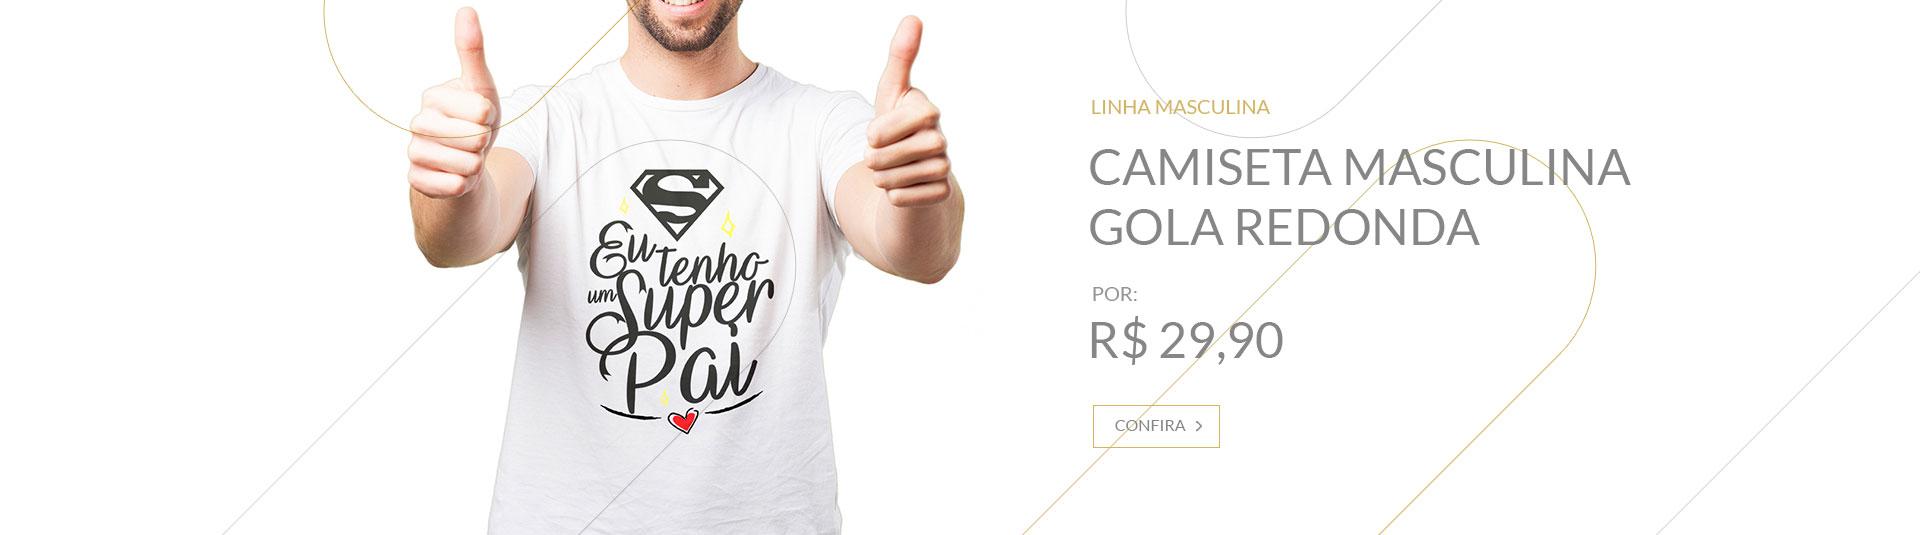 Banner Camsieta Masculina